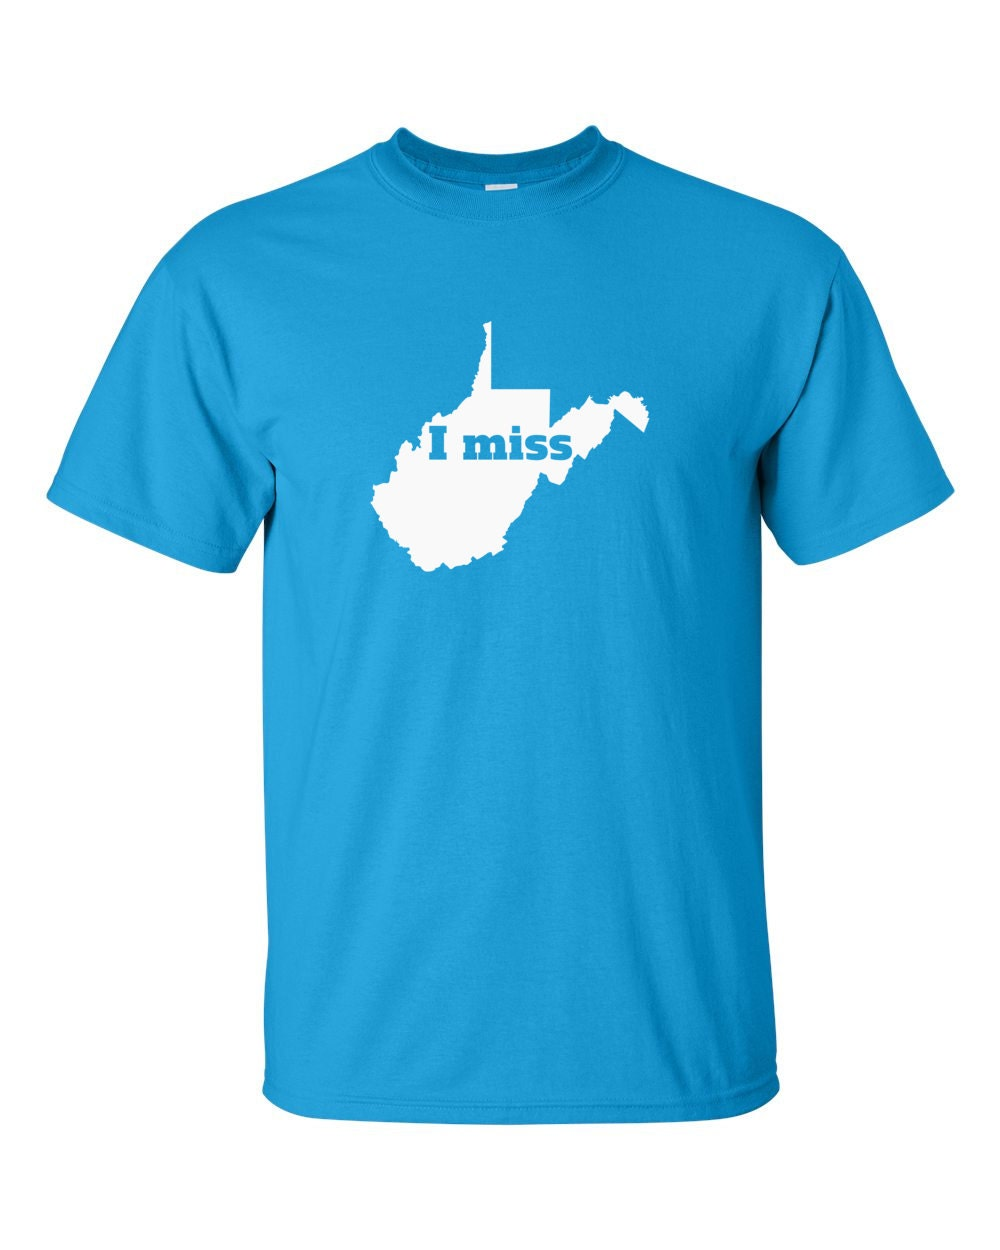 West Virginia T-shirt - I Miss West Virginia - My State West Virginia T-shirt